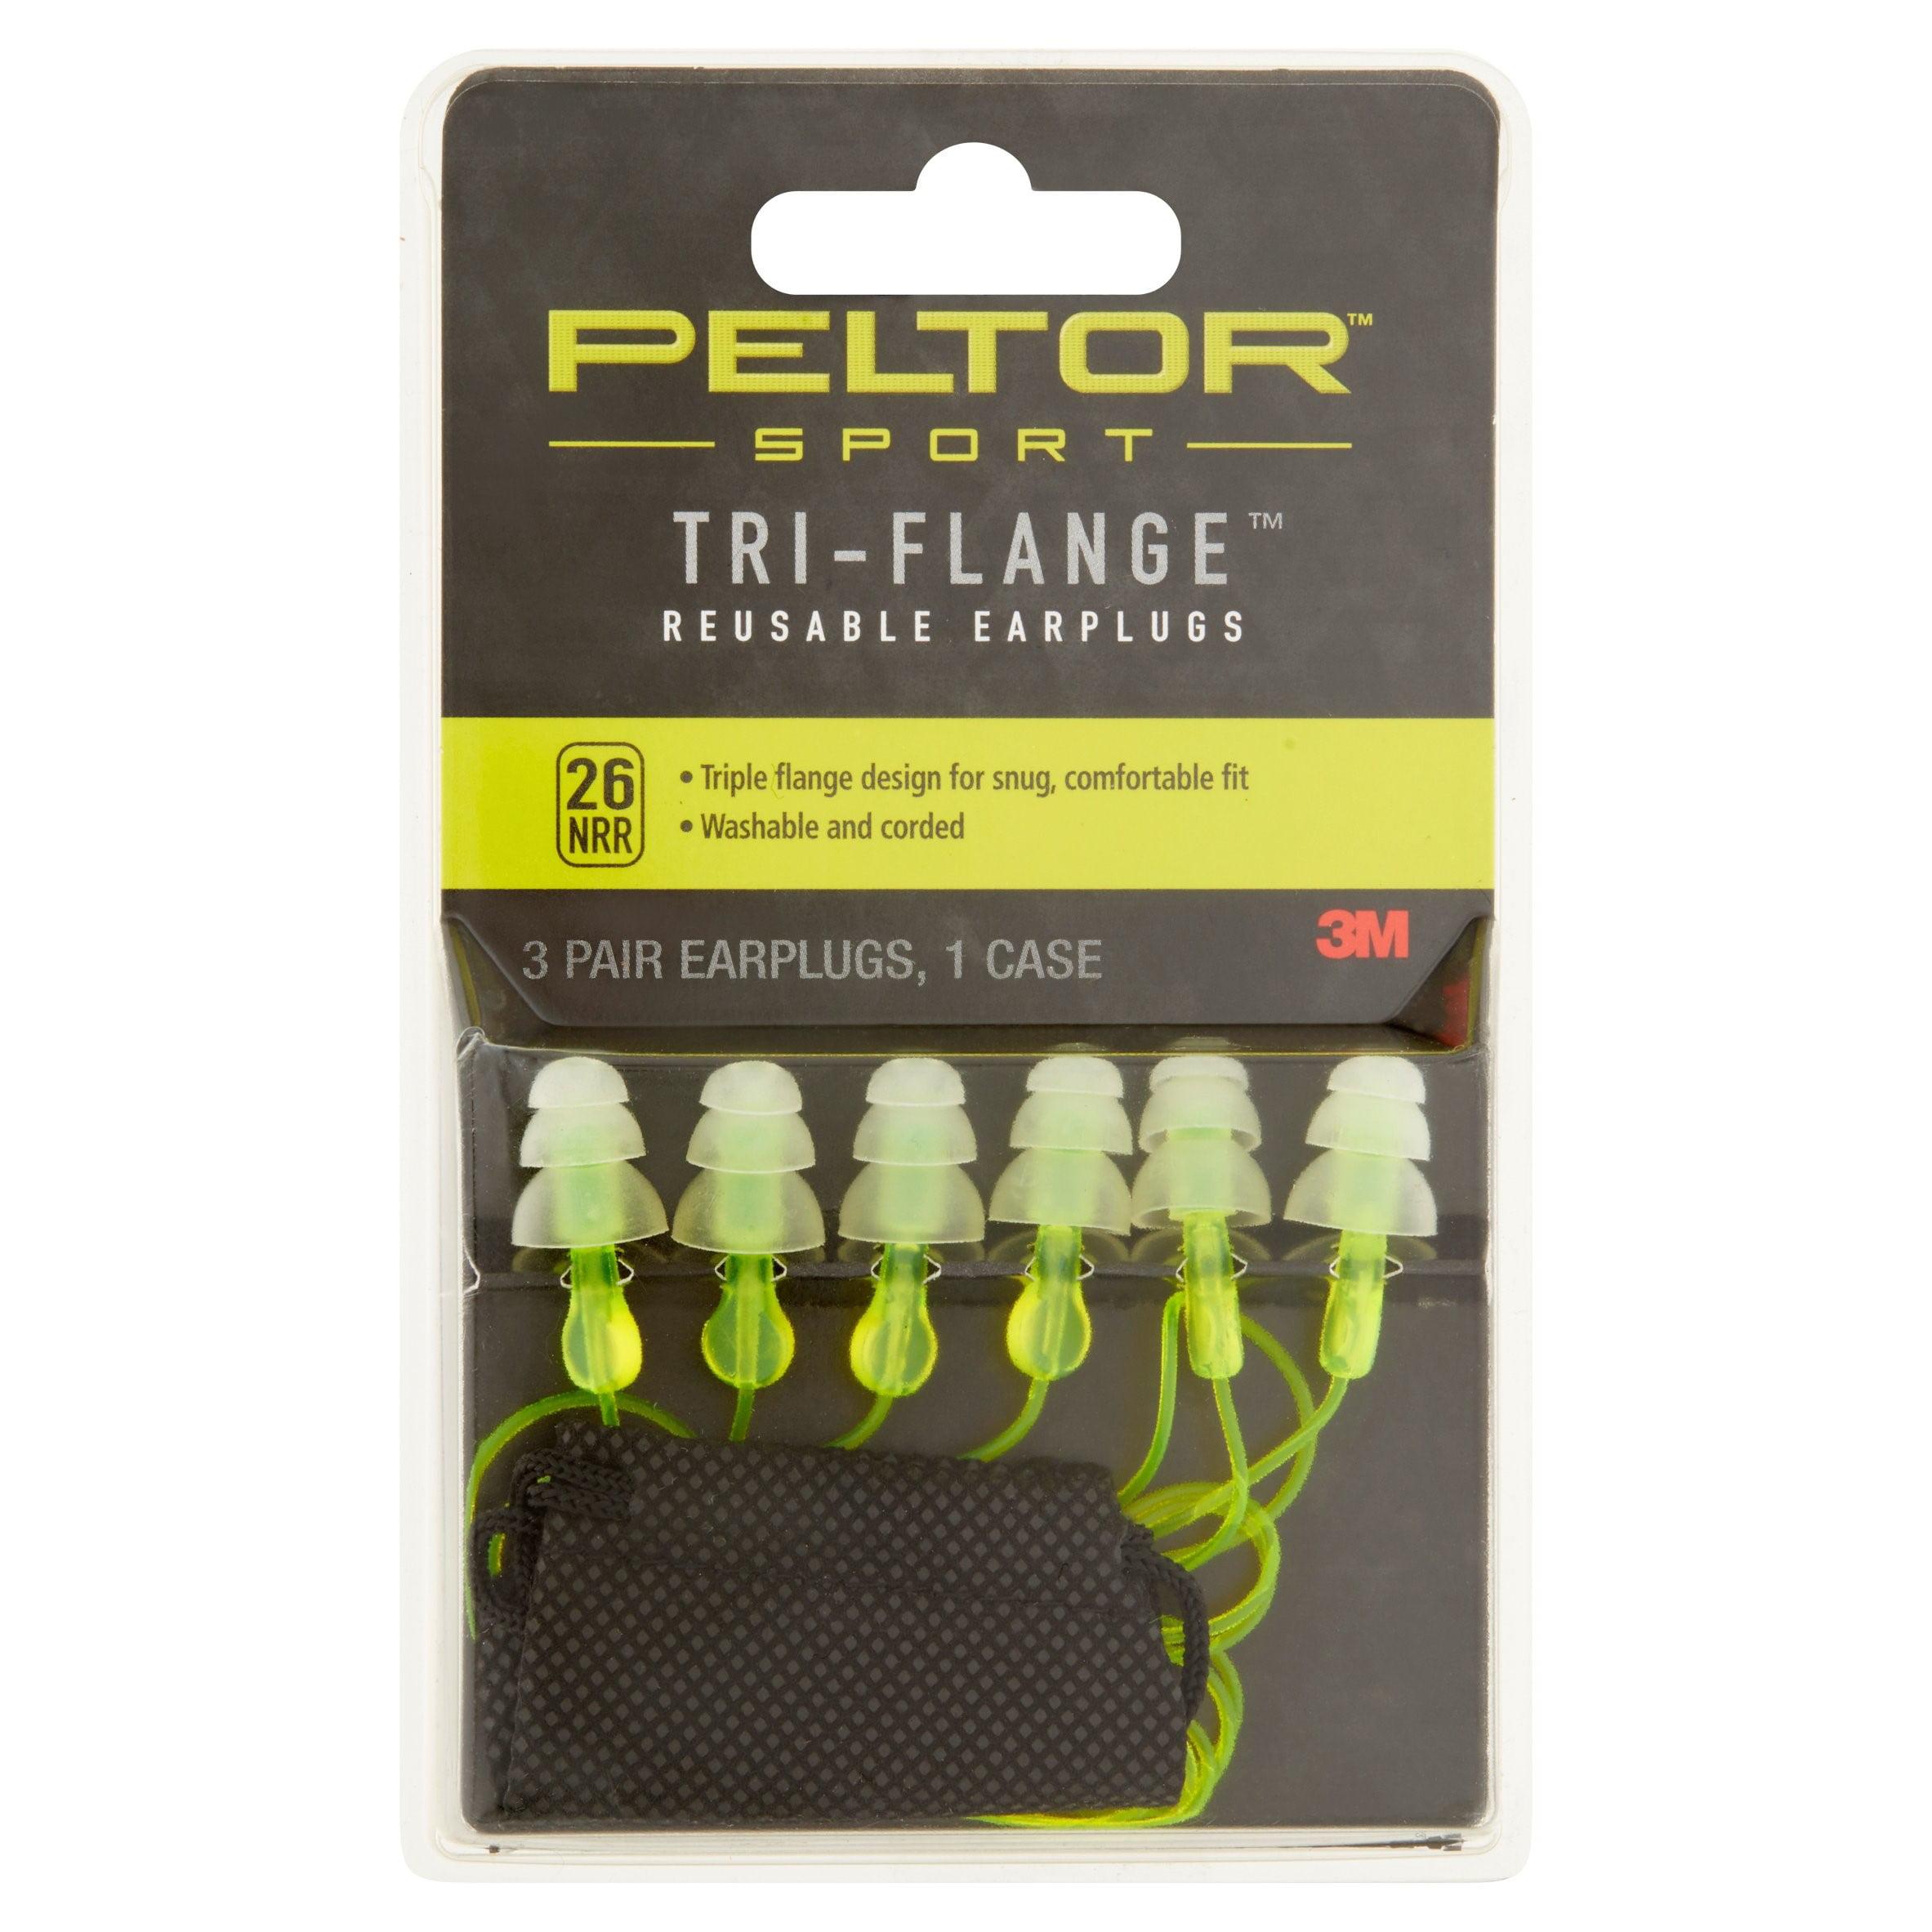 3M Peltor Sport Tri-Flange Reusable Earplugs